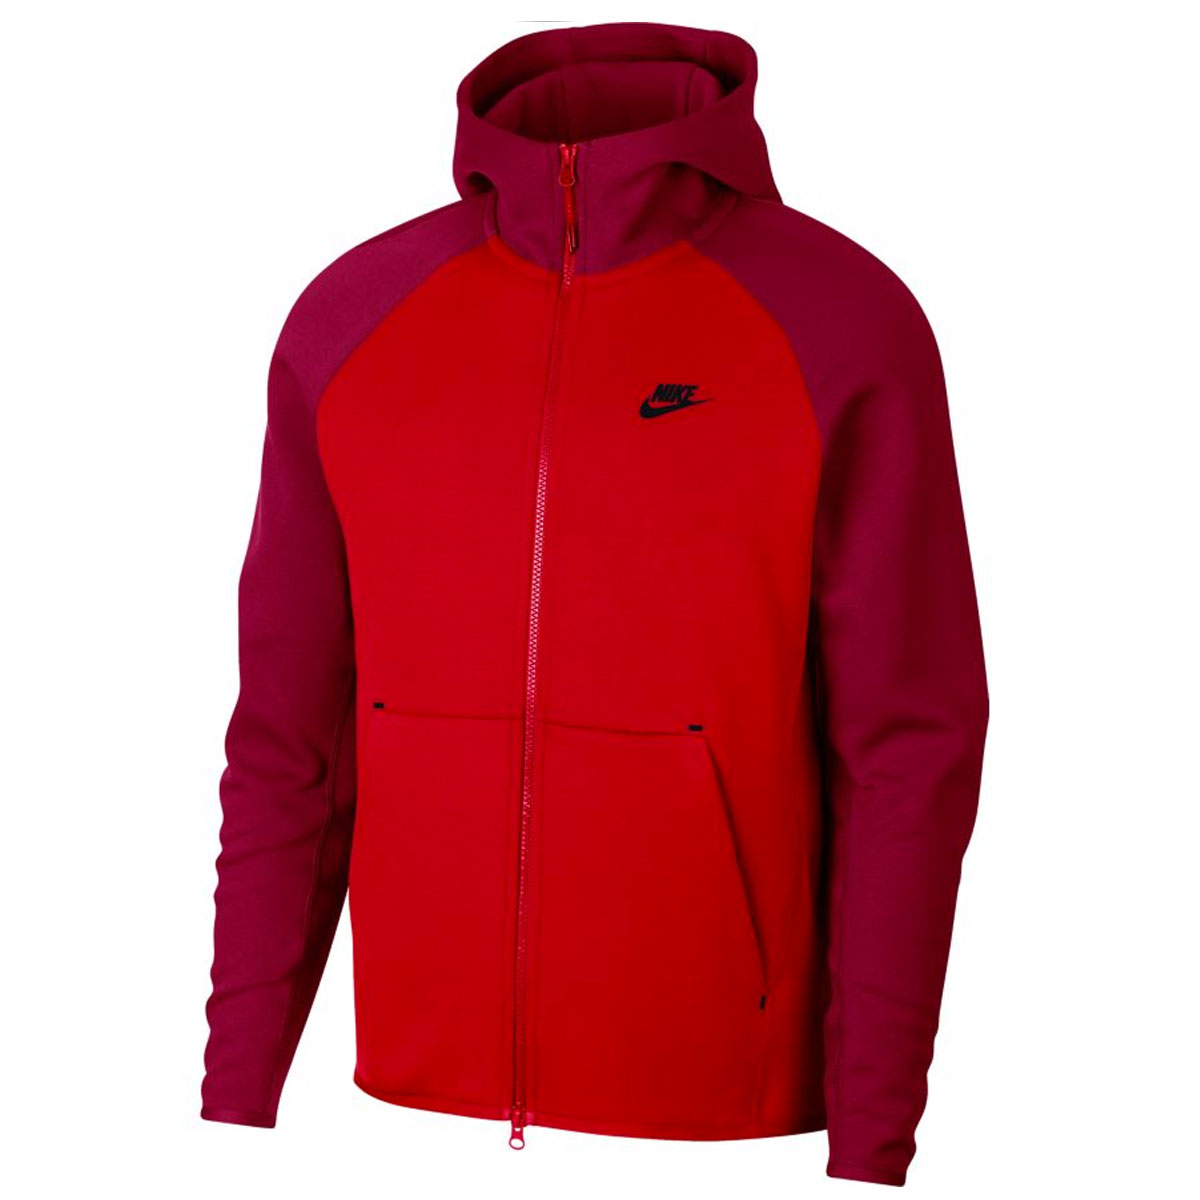 0b7ff2f8910e Nike Tech Fleece Full Zip hoodie. 928483 657 University Red Team Red Black